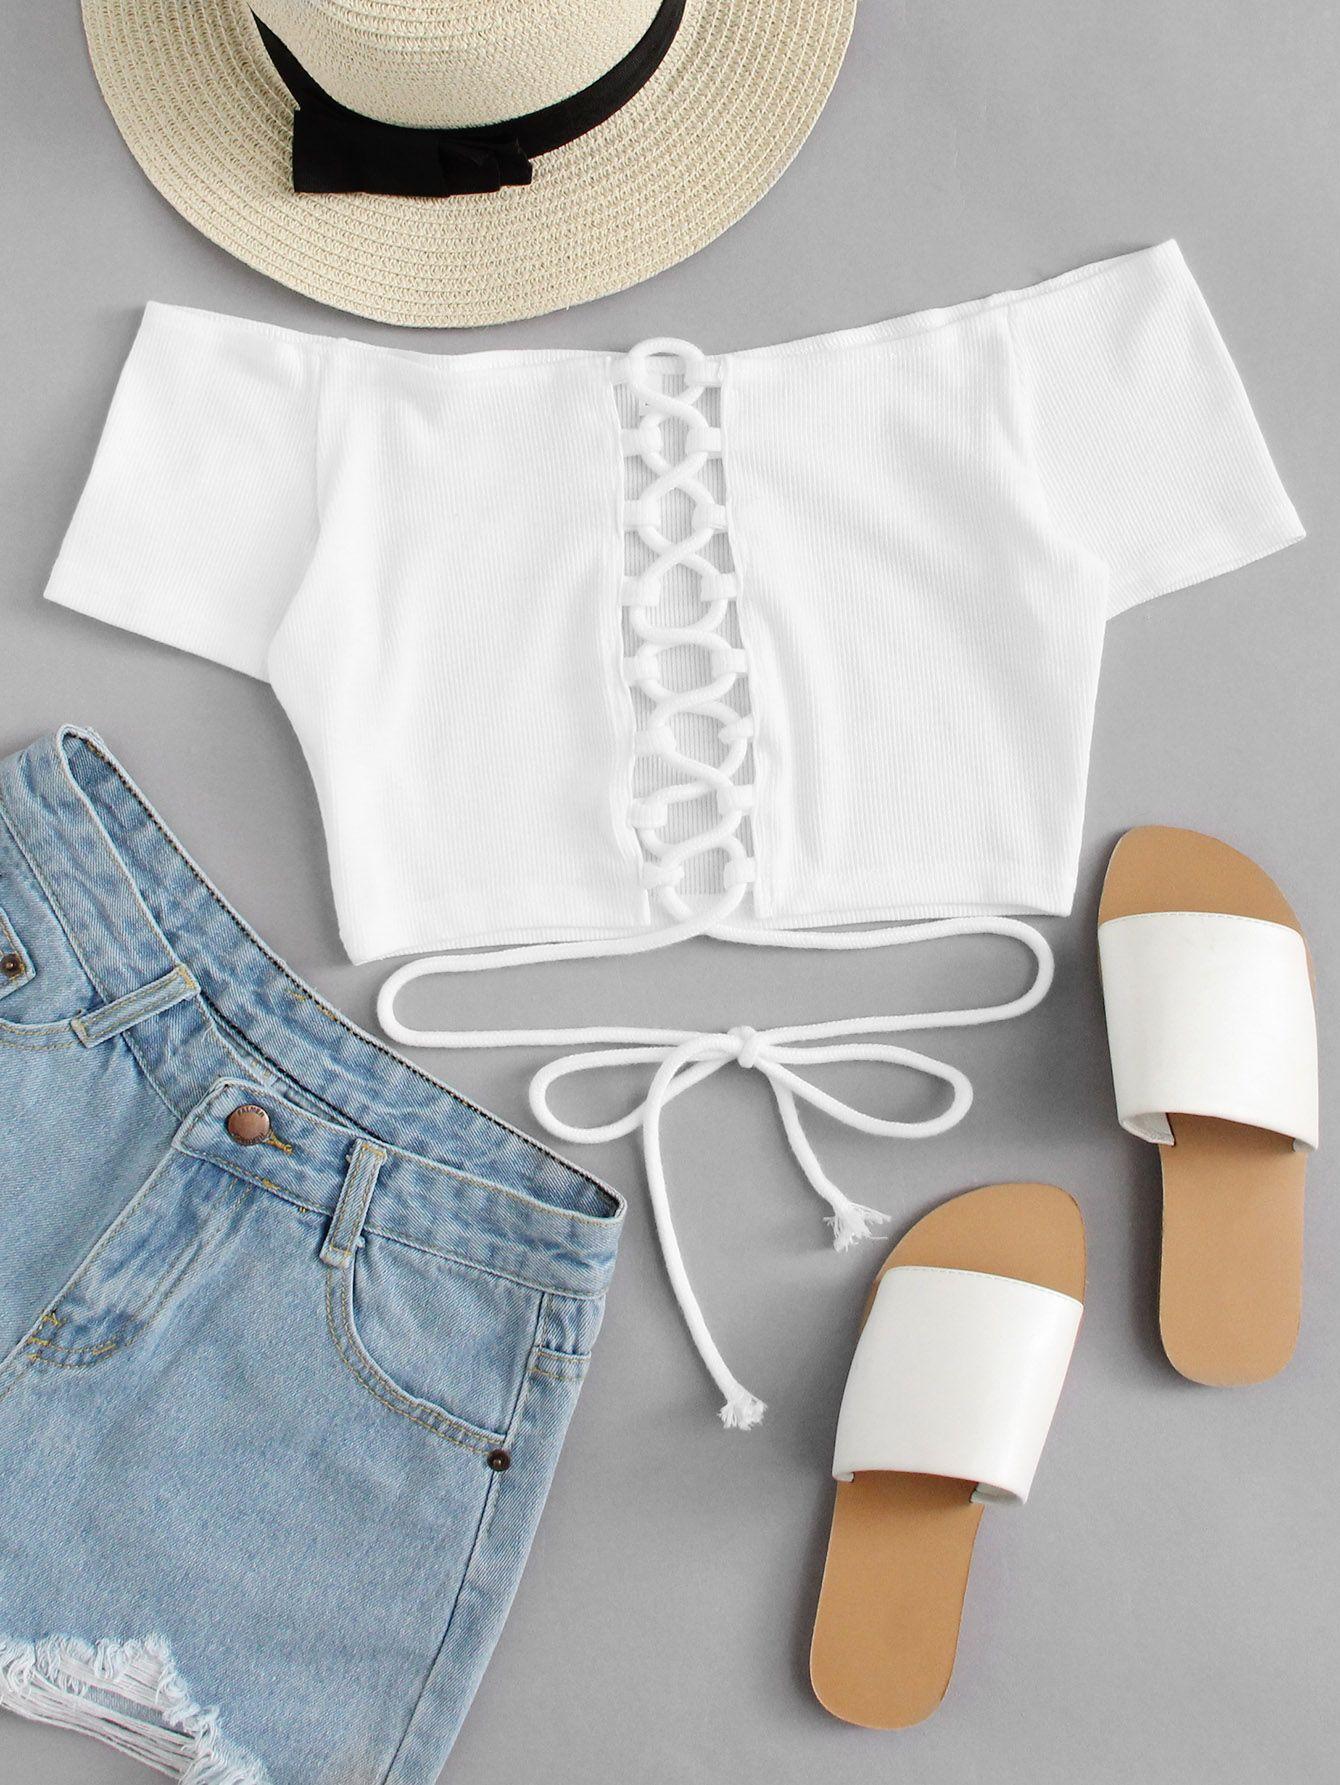 c05a793485c4 Off Shoulder Lace Up Crop Top -SheIn(Sheinside) | Shopping in 2019 ...